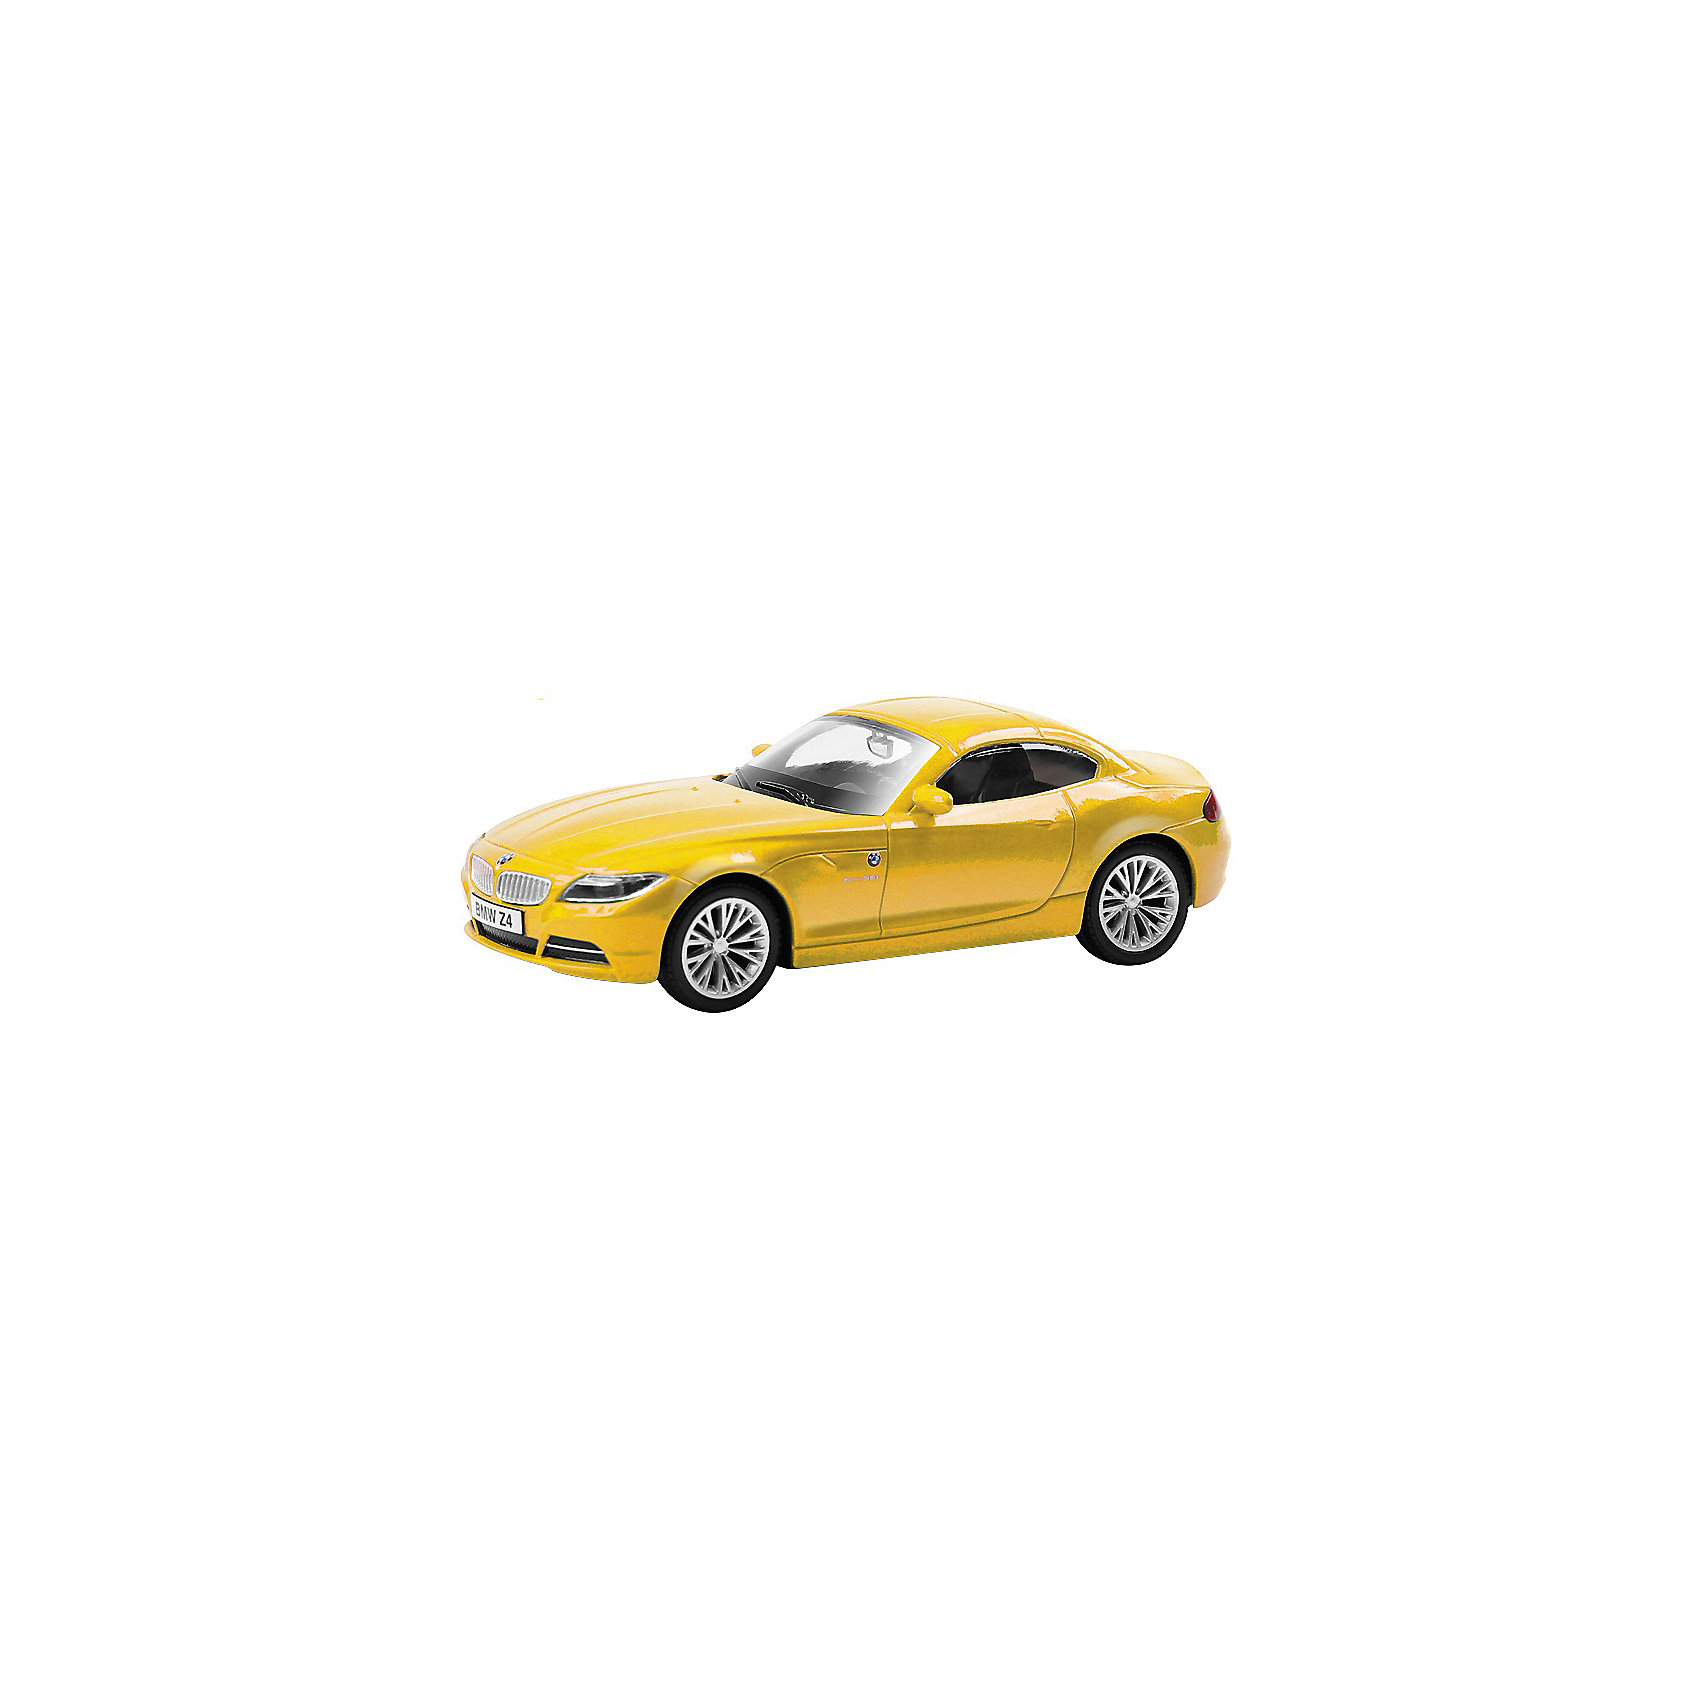 Машинка BMW Z4 1:43, AutotimeМашинки<br><br><br>Ширина мм: 165<br>Глубина мм: 57<br>Высота мм: 75<br>Вес г: 13<br>Возраст от месяцев: 36<br>Возраст до месяцев: 2147483647<br>Пол: Мужской<br>Возраст: Детский<br>SKU: 5584090